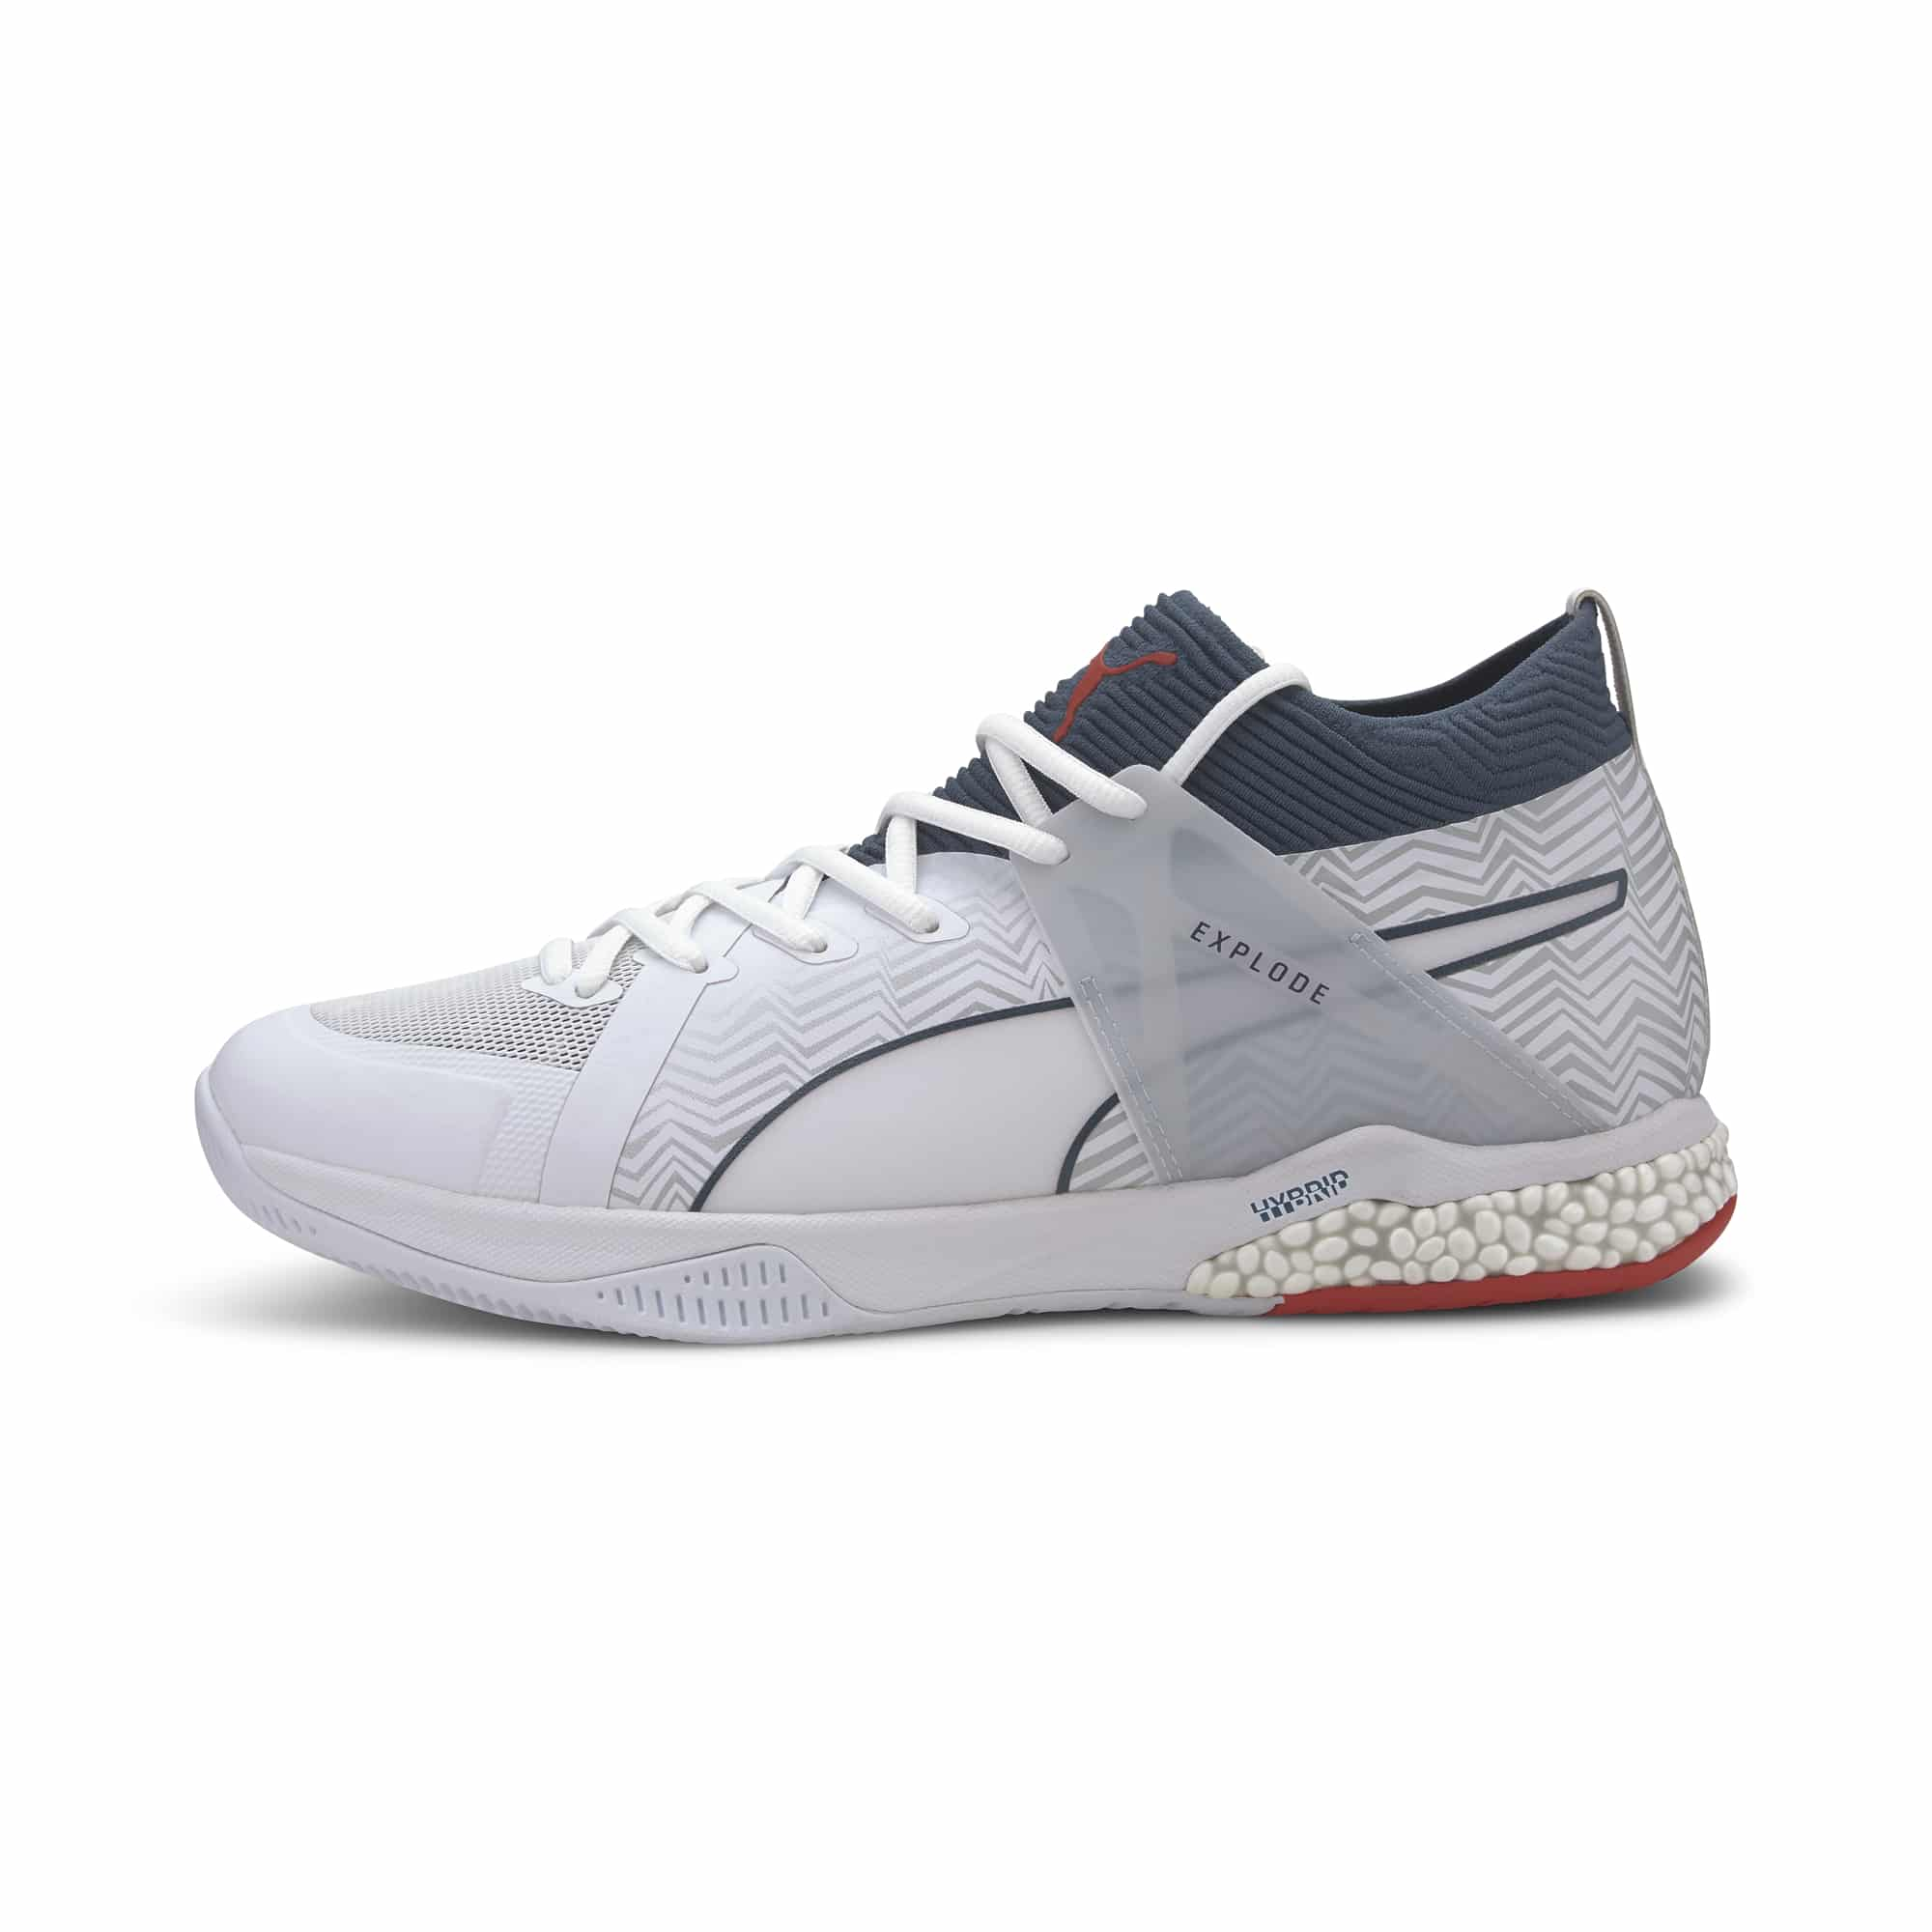 puma-explode-eh-1-chaussures-hand-2020-3